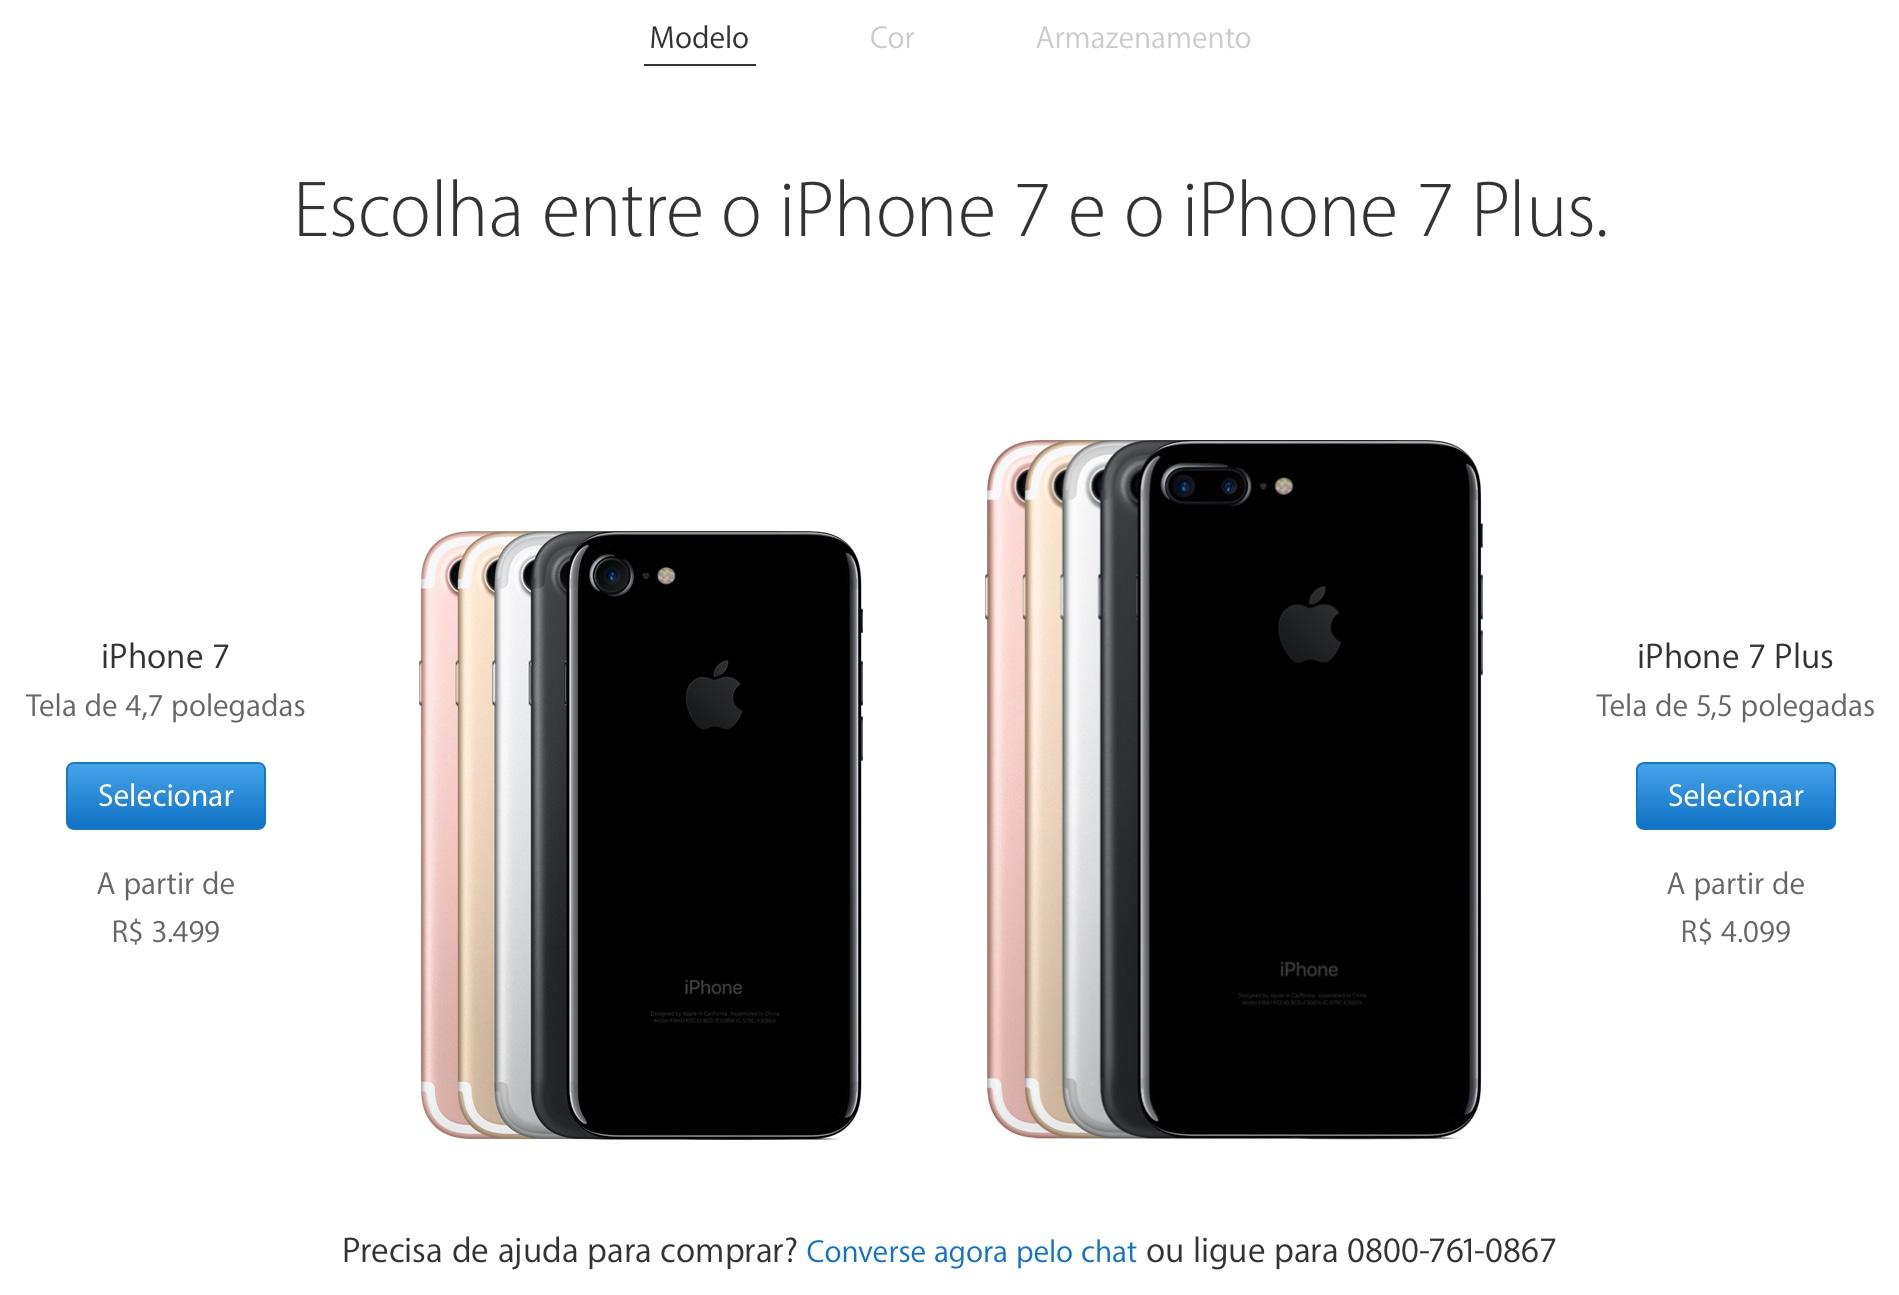 Página de venda dos iPhones 7/7 Plus